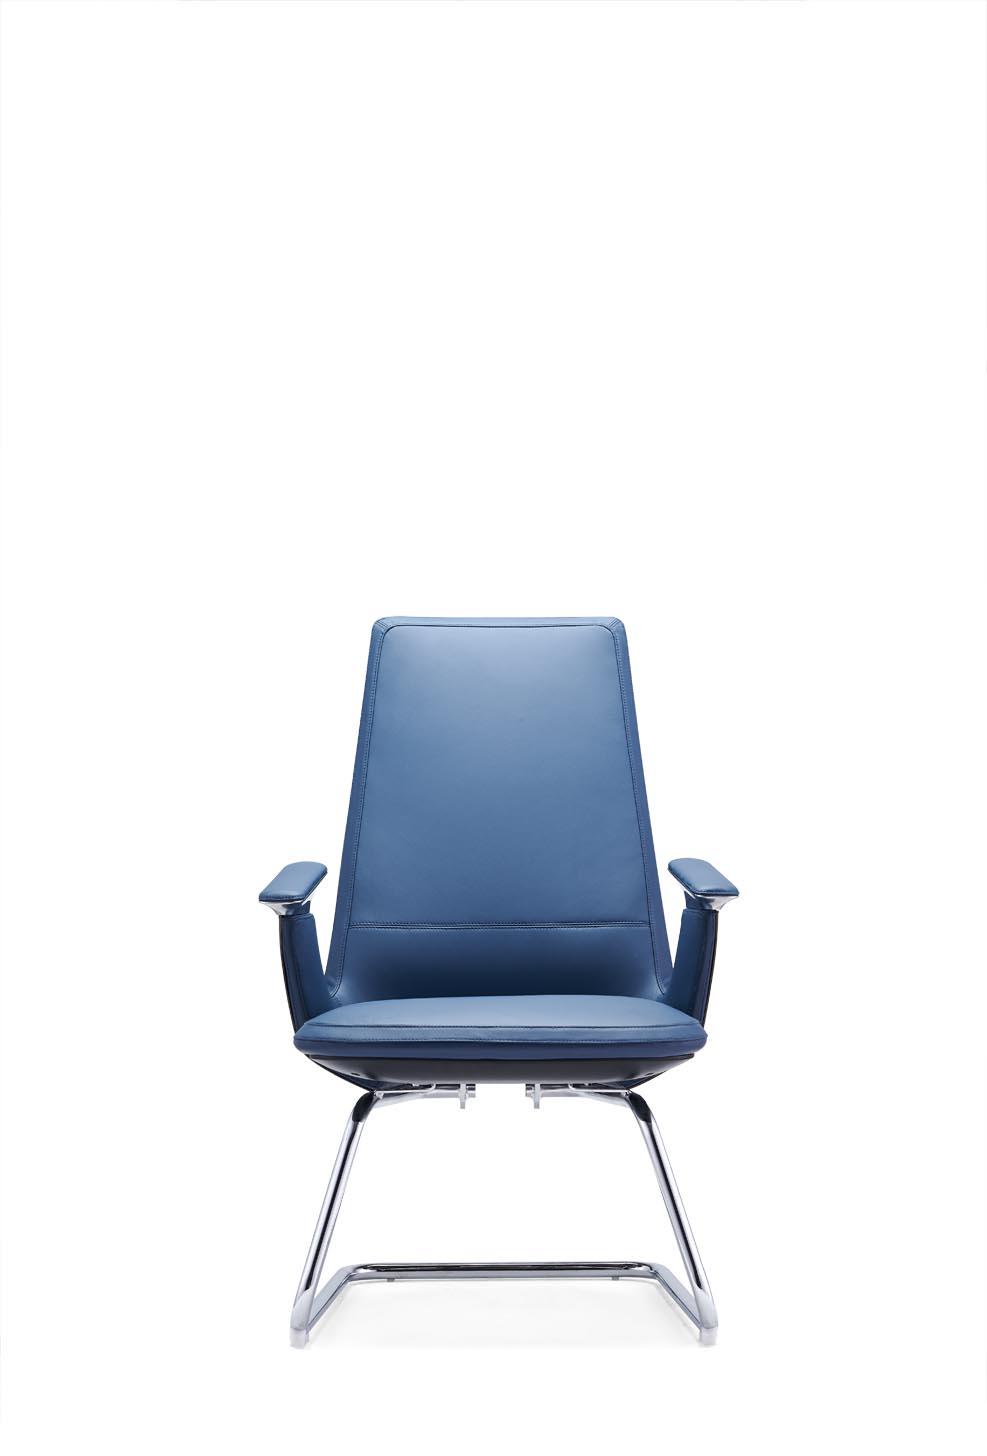 HY-4011經理椅